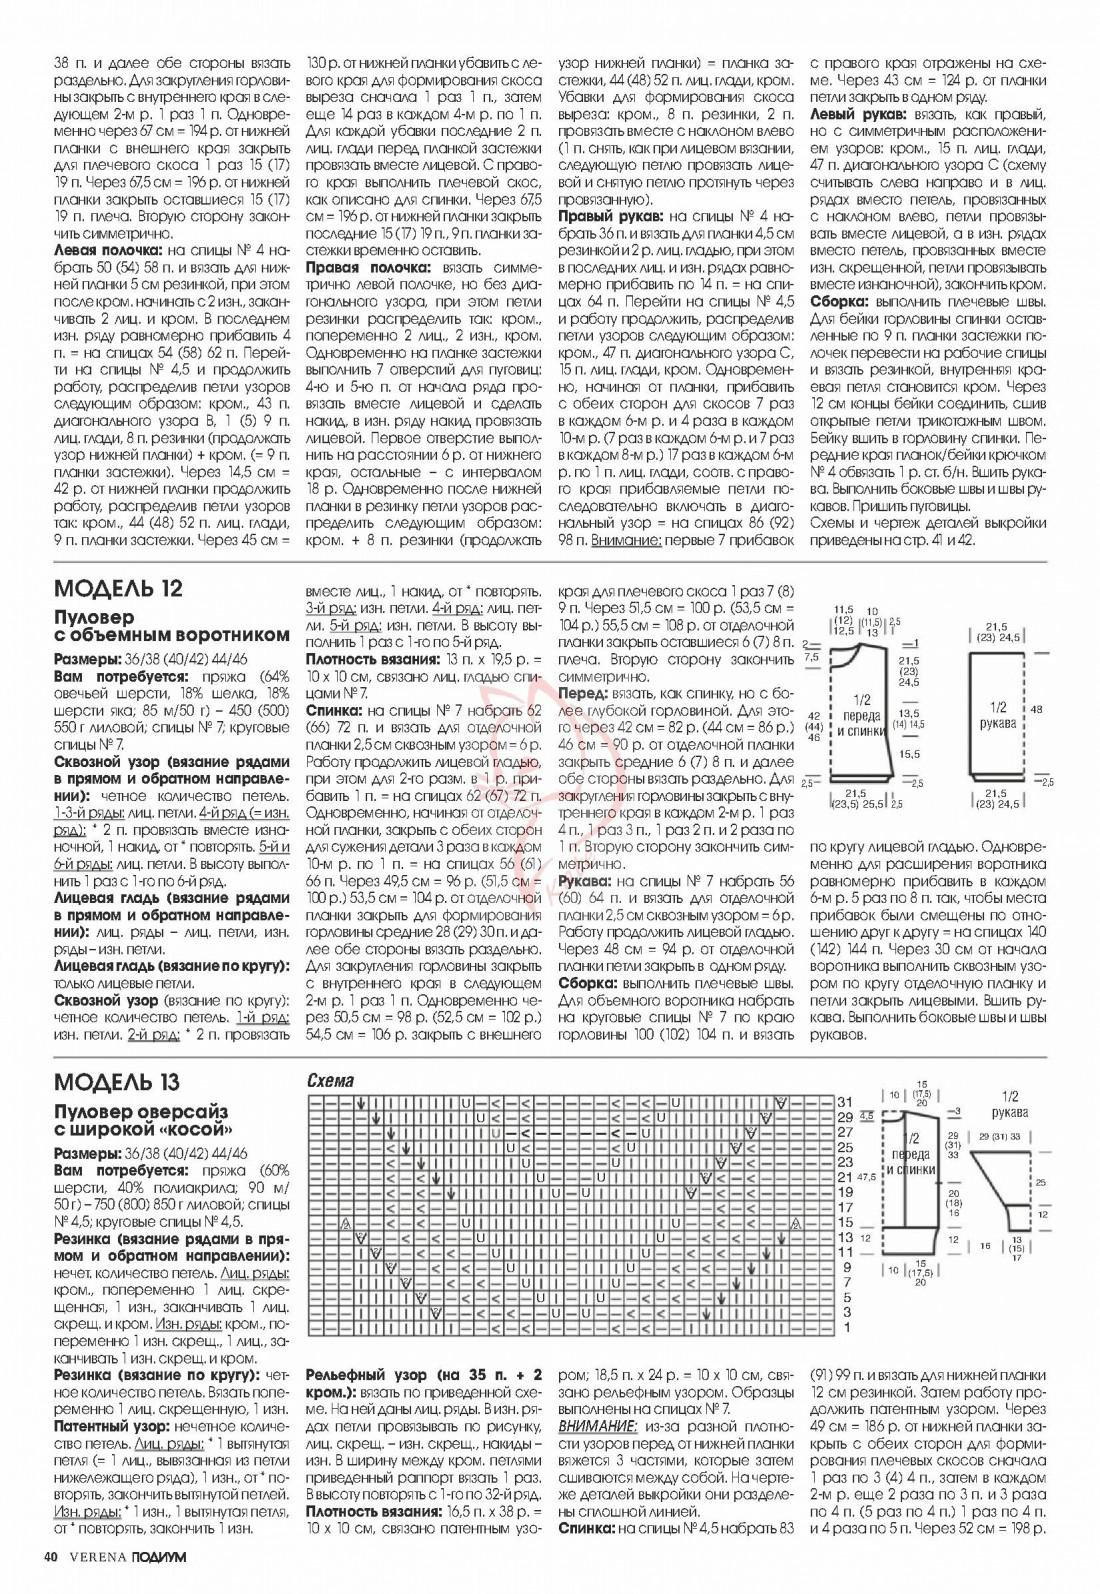 Page_00040c7610cd919dfd619.jpg